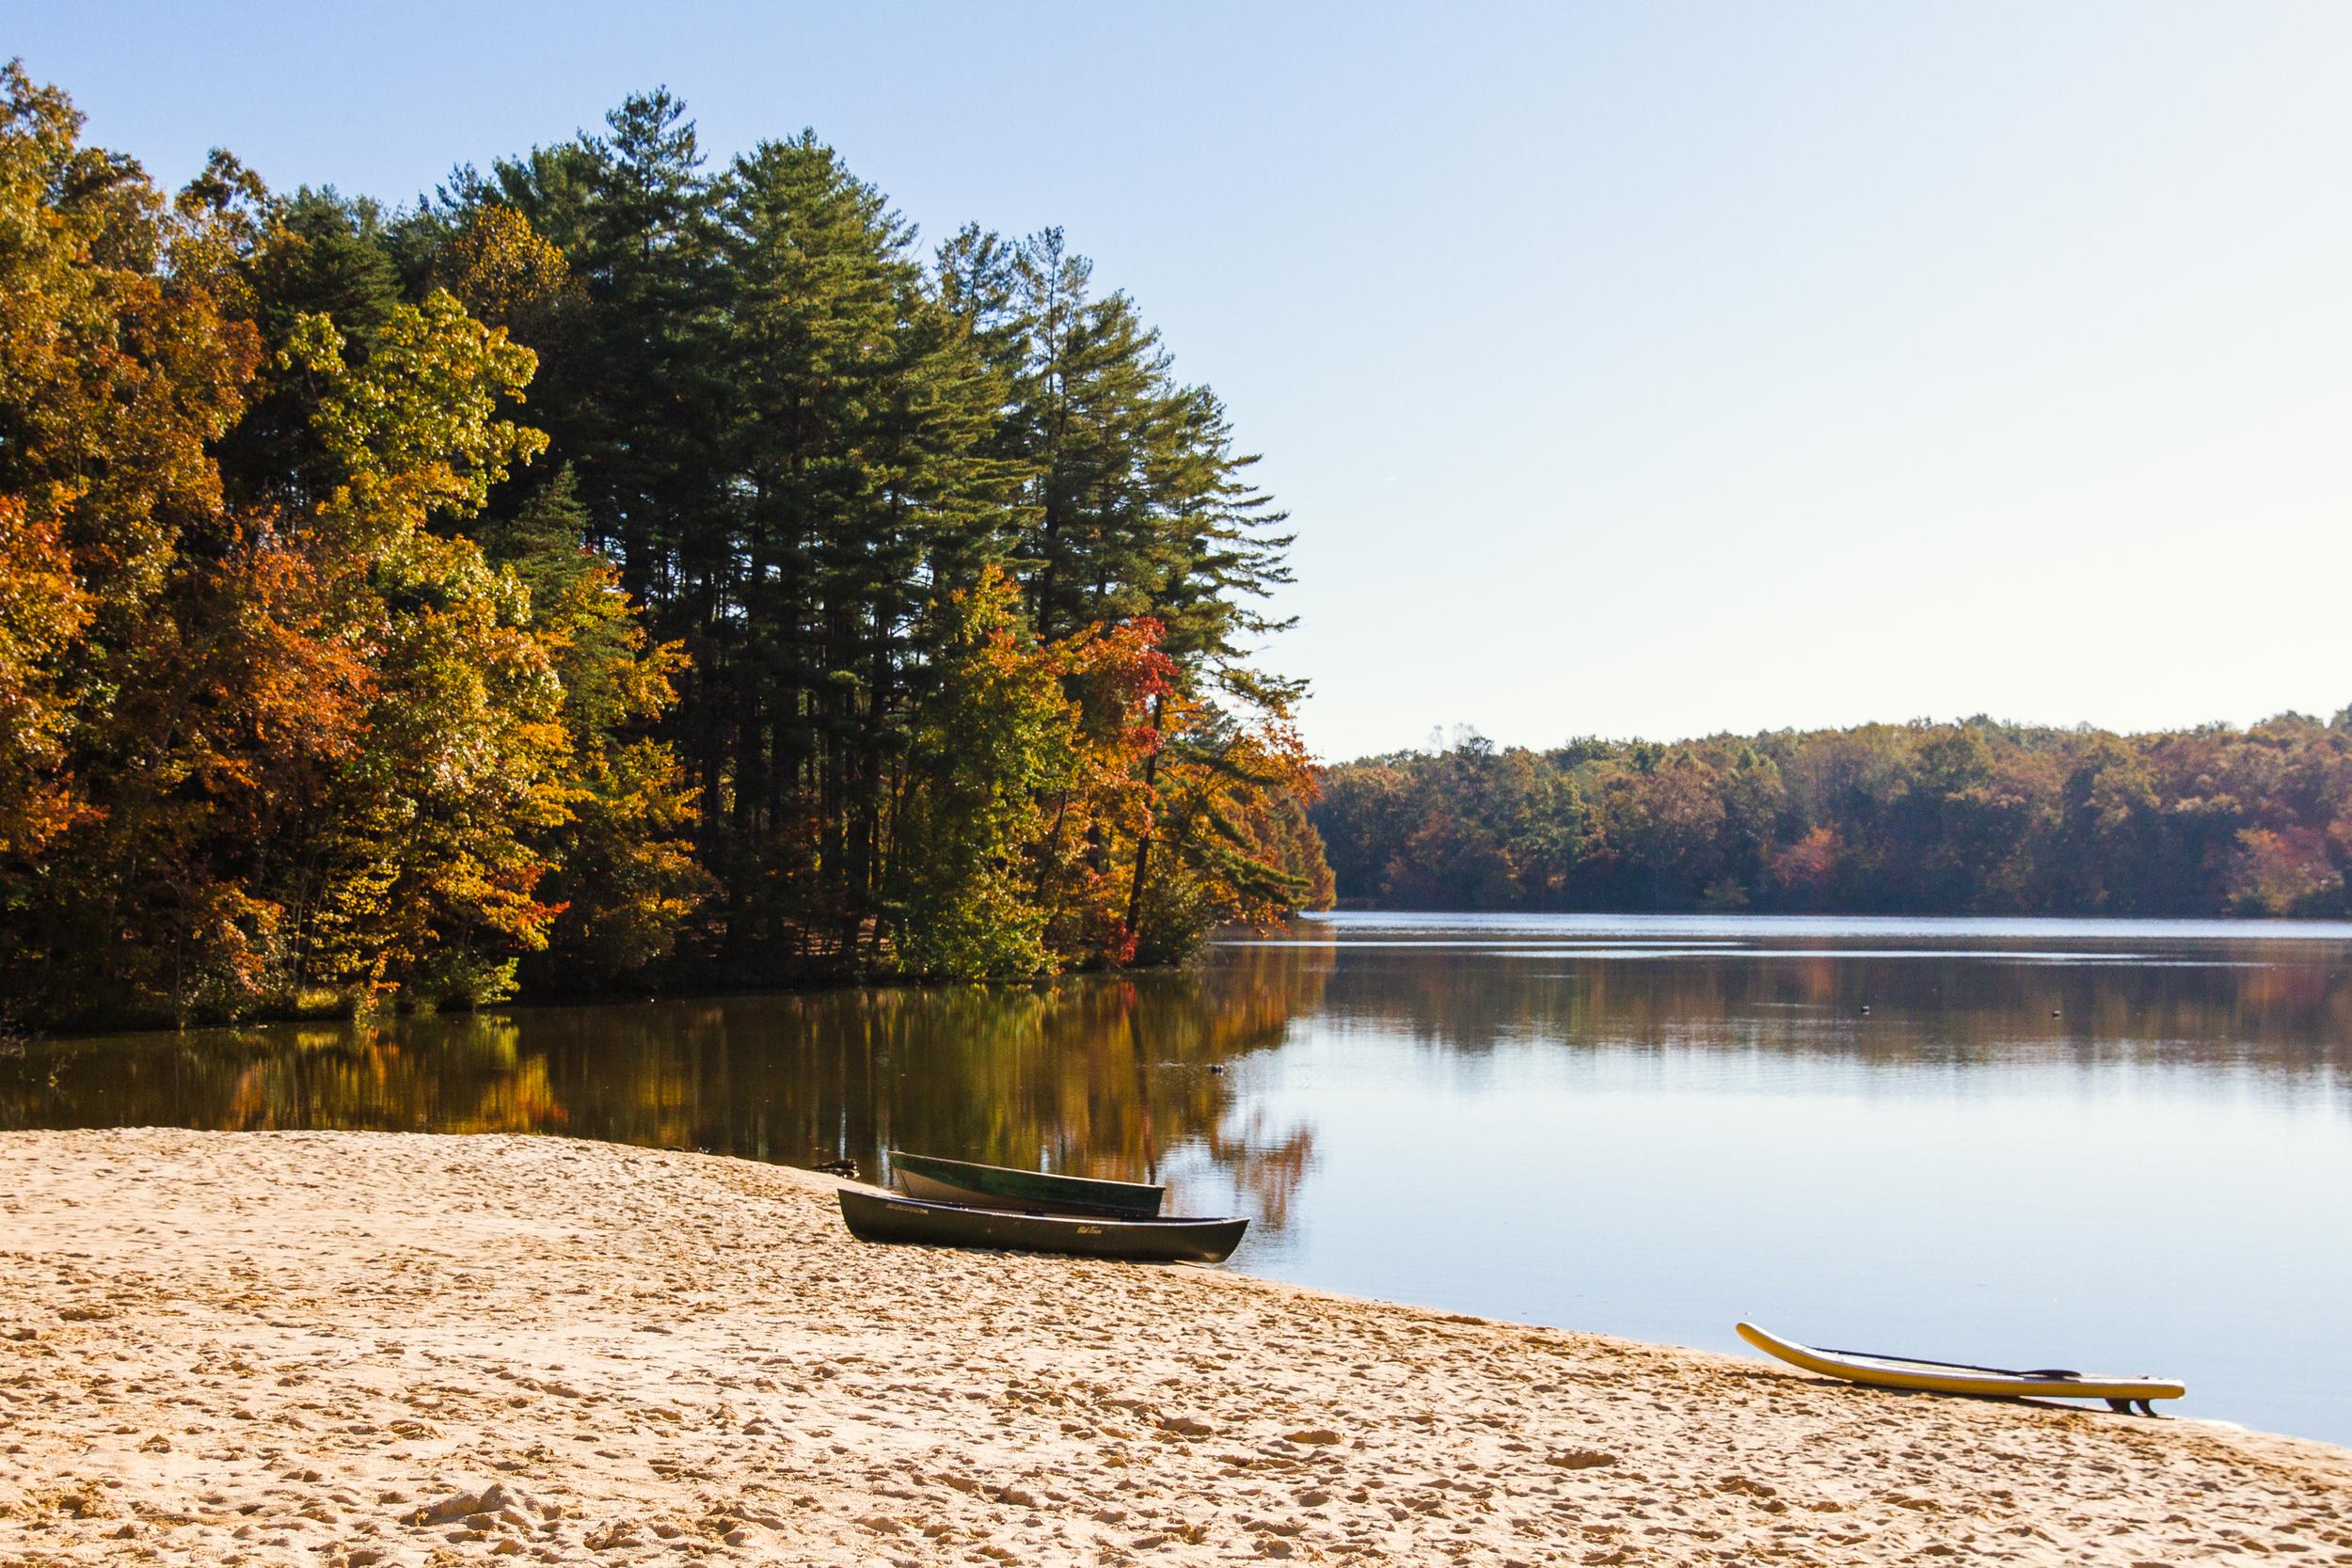 LakeFrances-Fall2015-Proof-024-_MG_7390.jpg